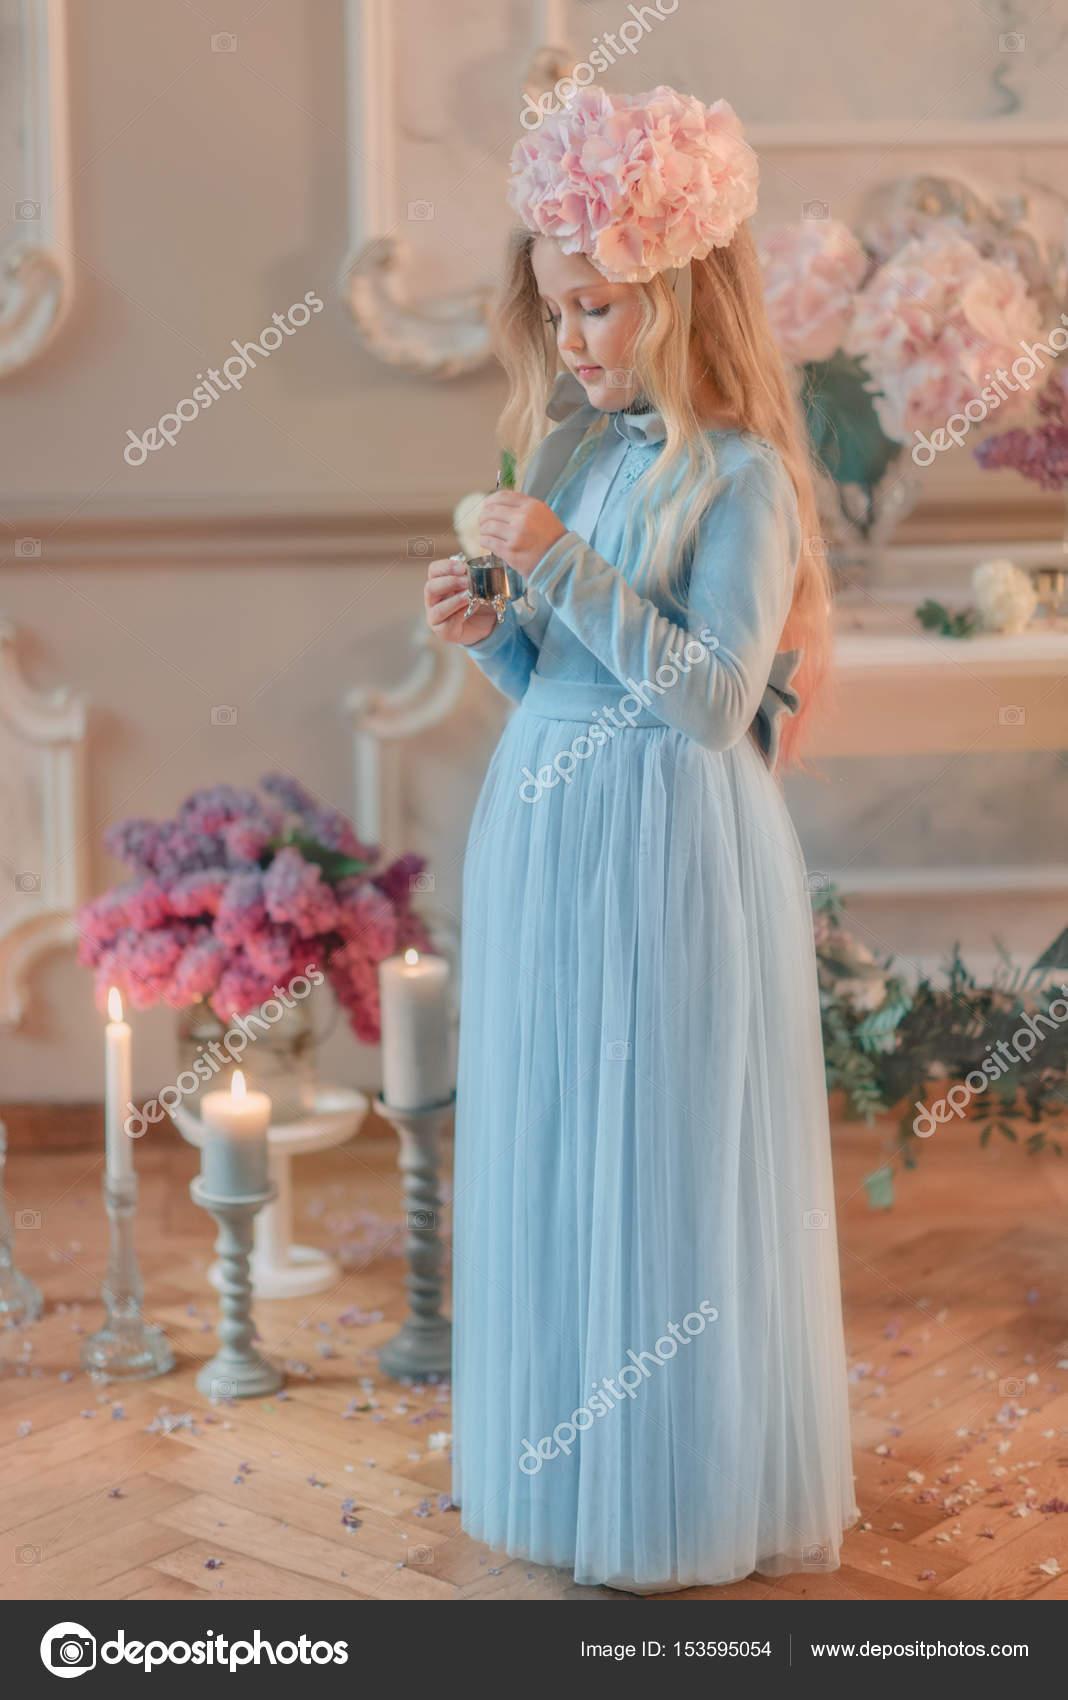 dadc2cac70c3 Floral Studio το ξανθό κορίτσι με γαλάζιο μακρύ φόρεμα και ένα λουλούδι στο  κεφάλι — Εικόνα από ...